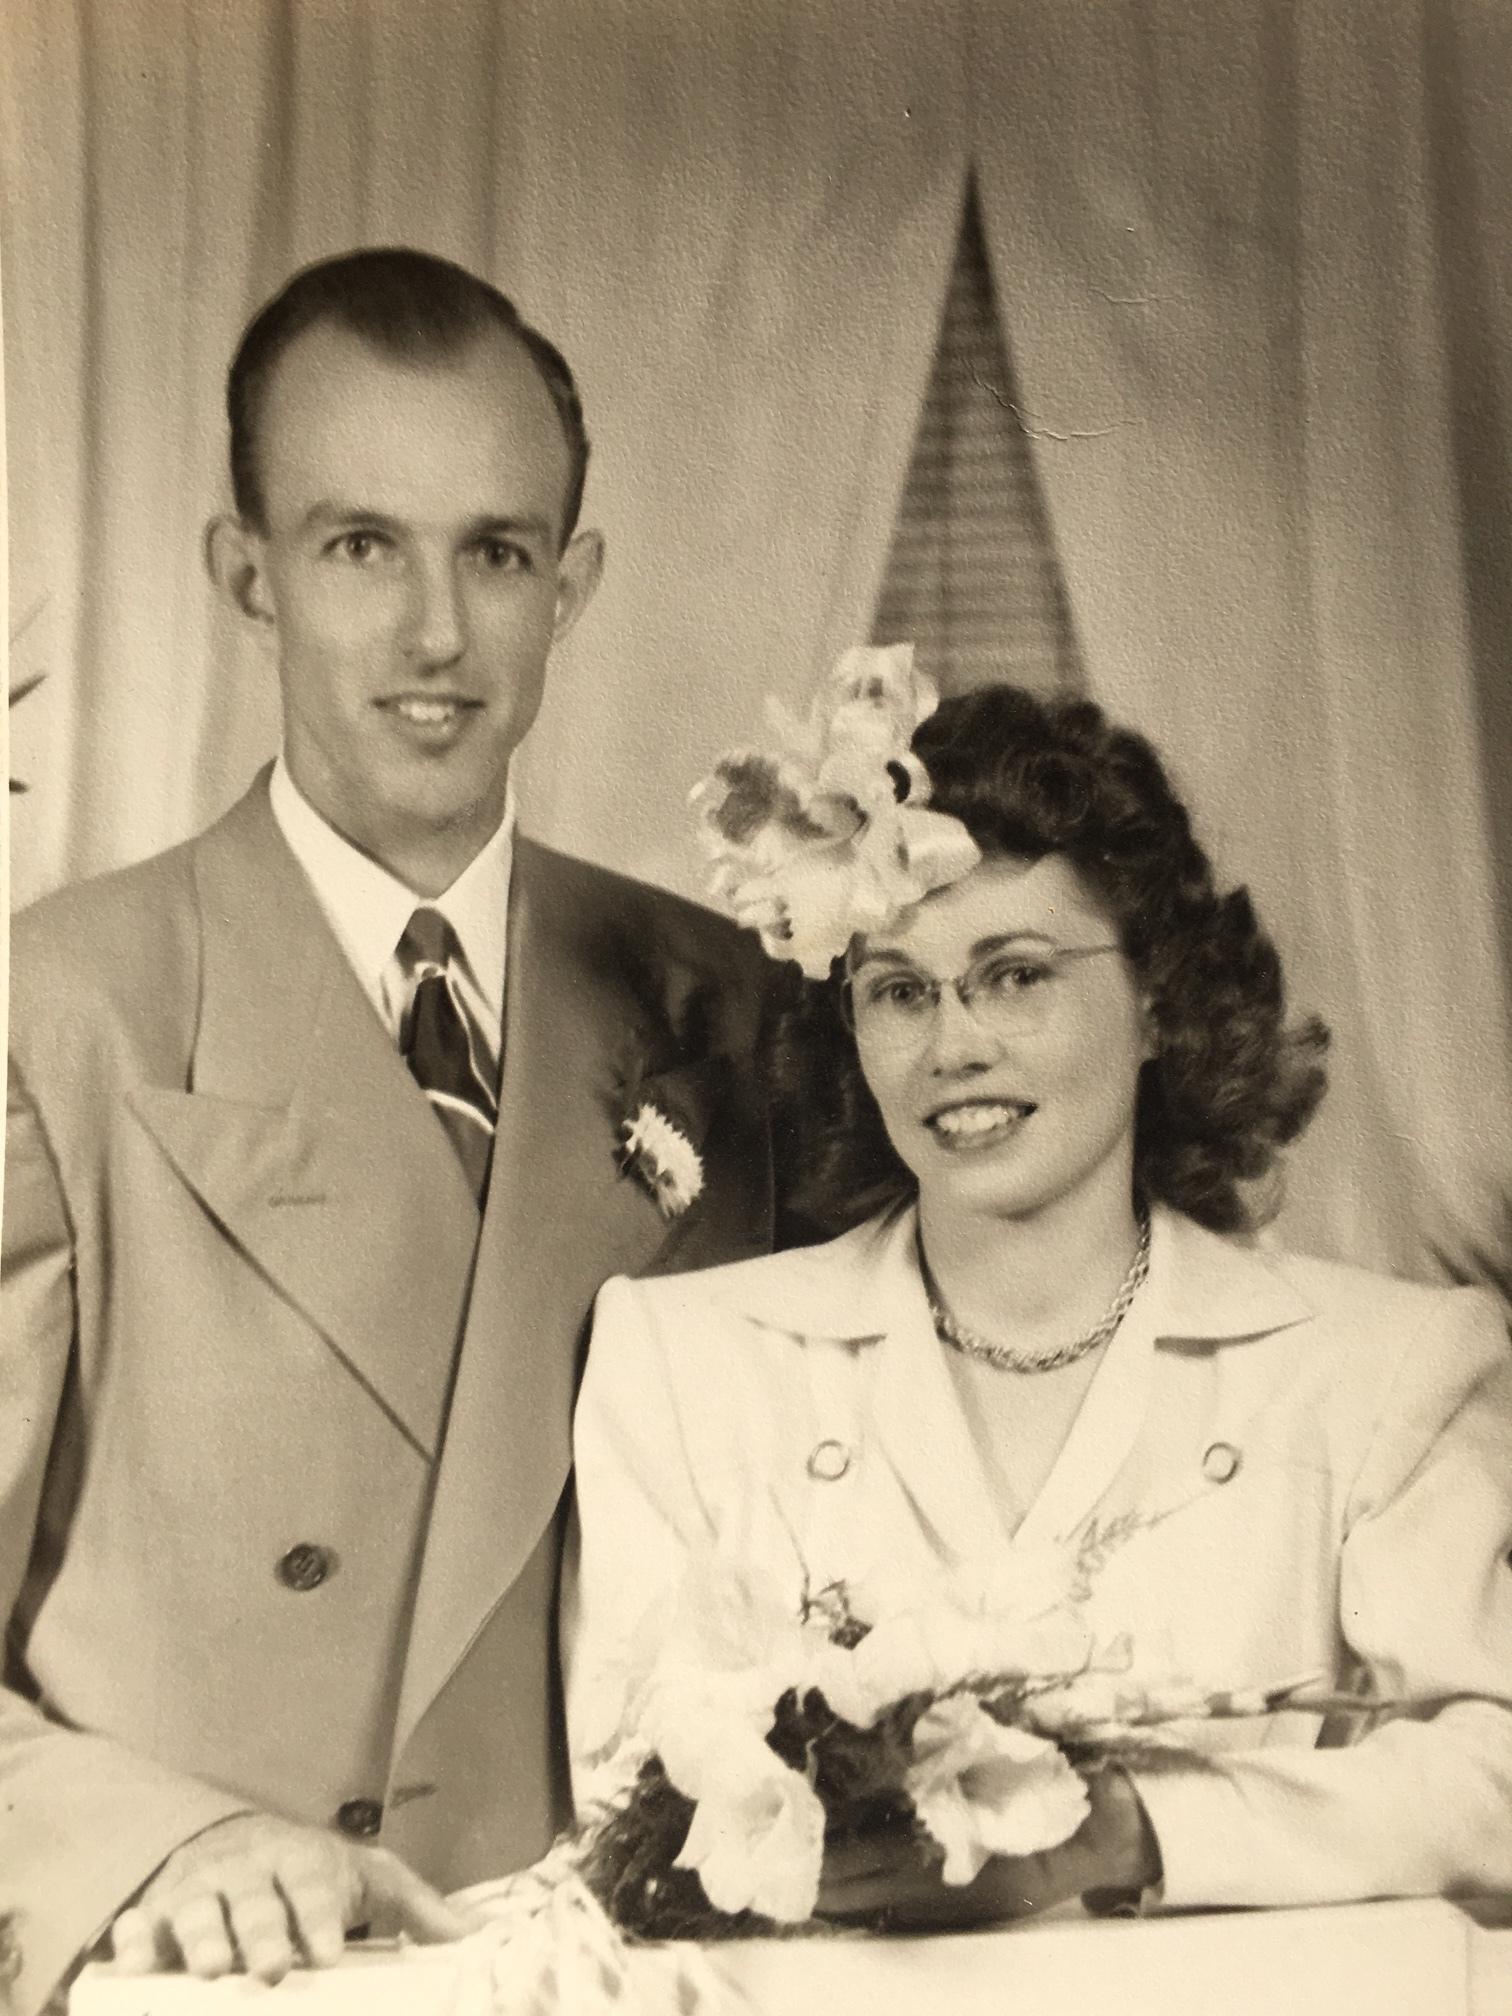 Robert and Ruth Hoshaw - photo courtesy of Stephanie McInroy